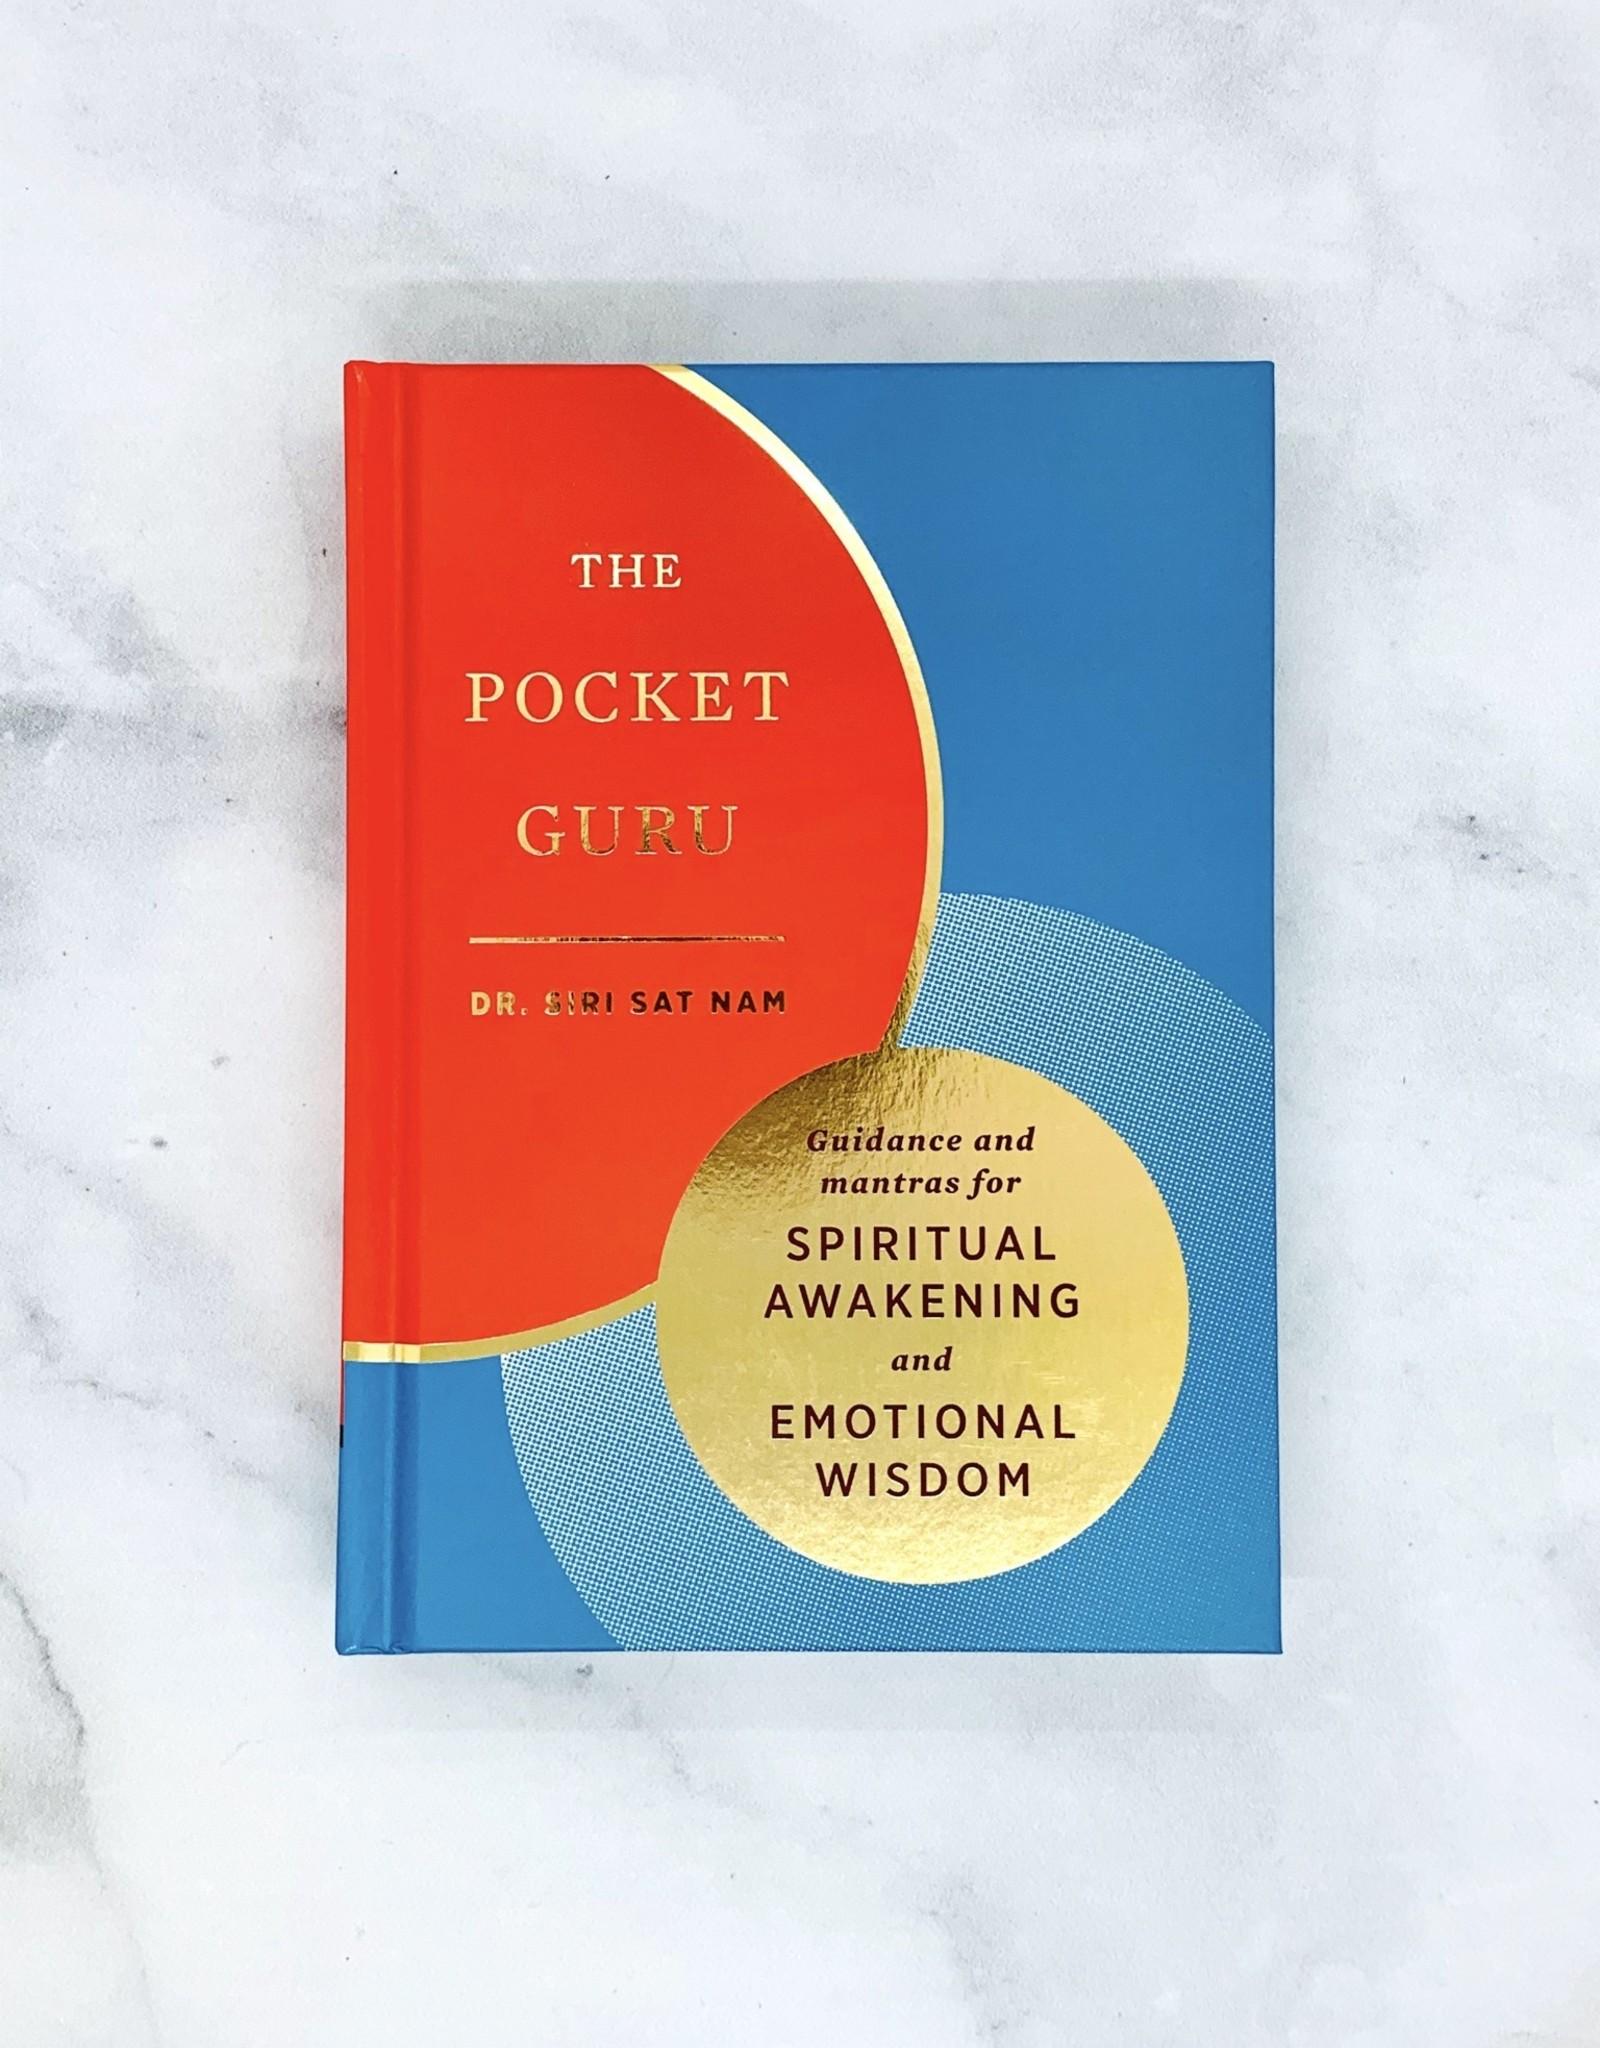 The Pocket Guru Guidance and Mantras for Spiritual Awakening and Emotional Wisdom